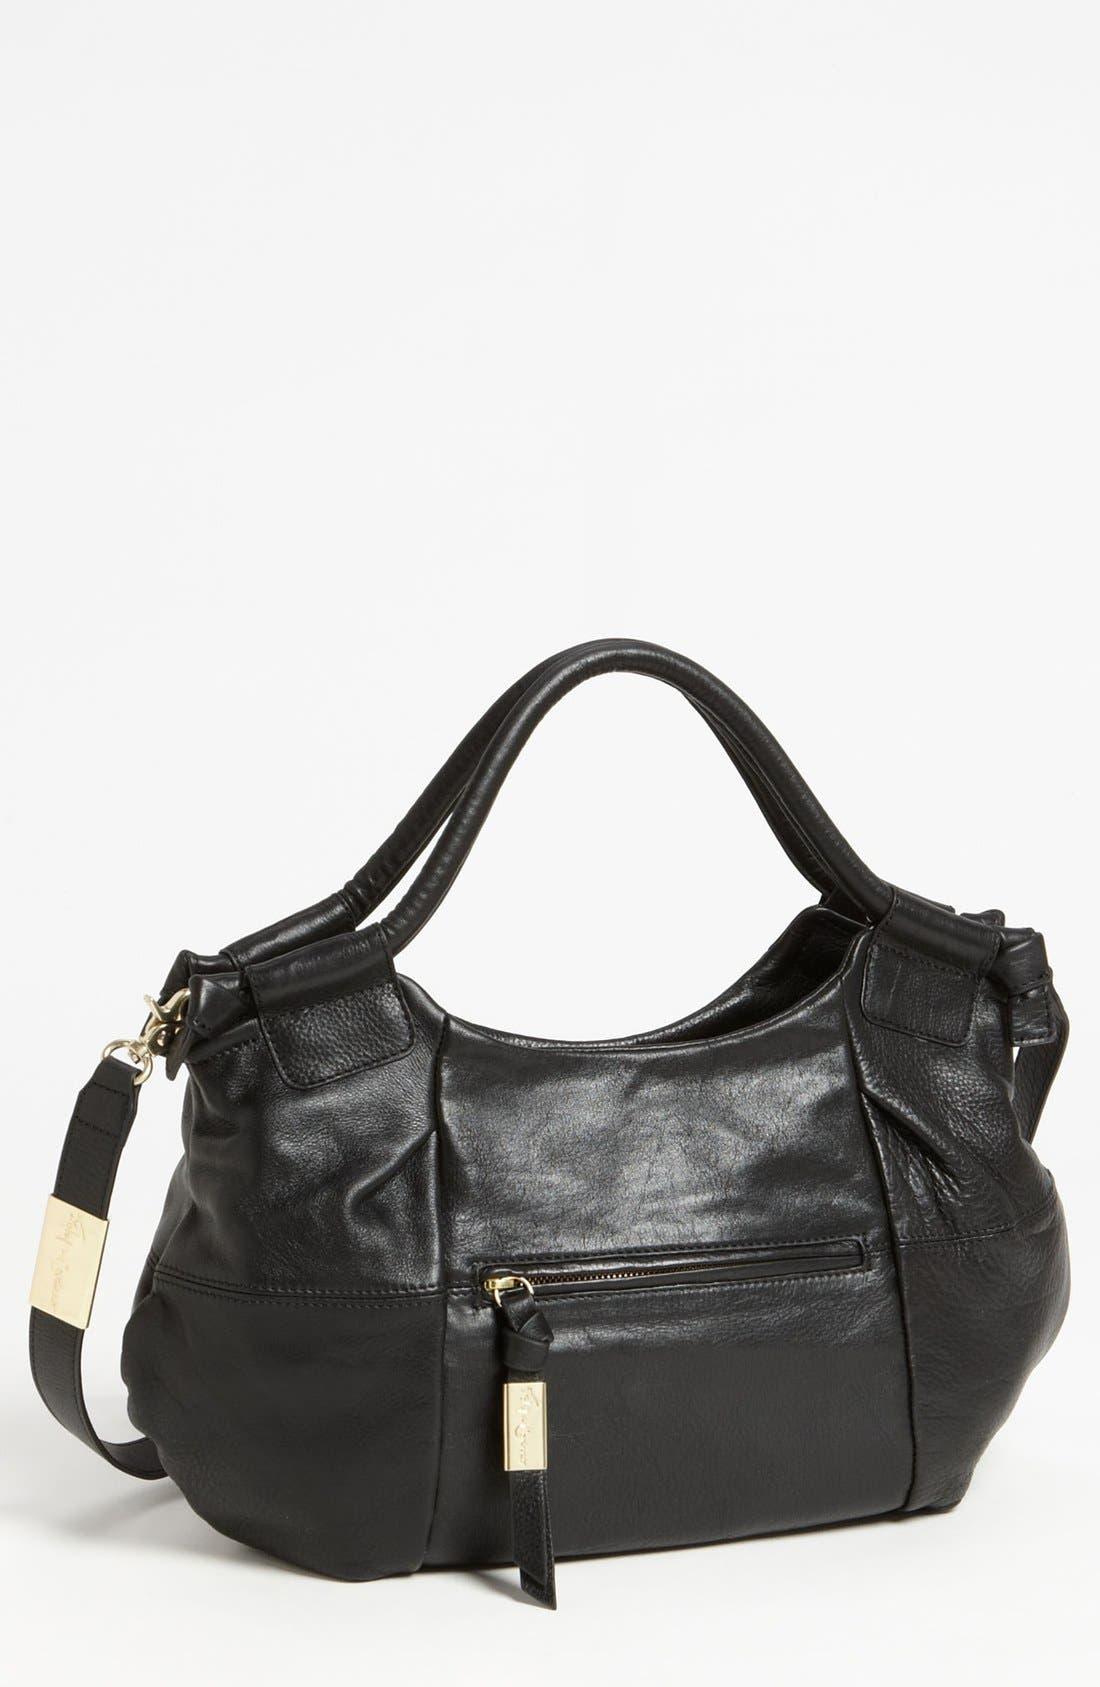 Main Image - Foley + Corinna 'Kami - Mini' Leather Satchel